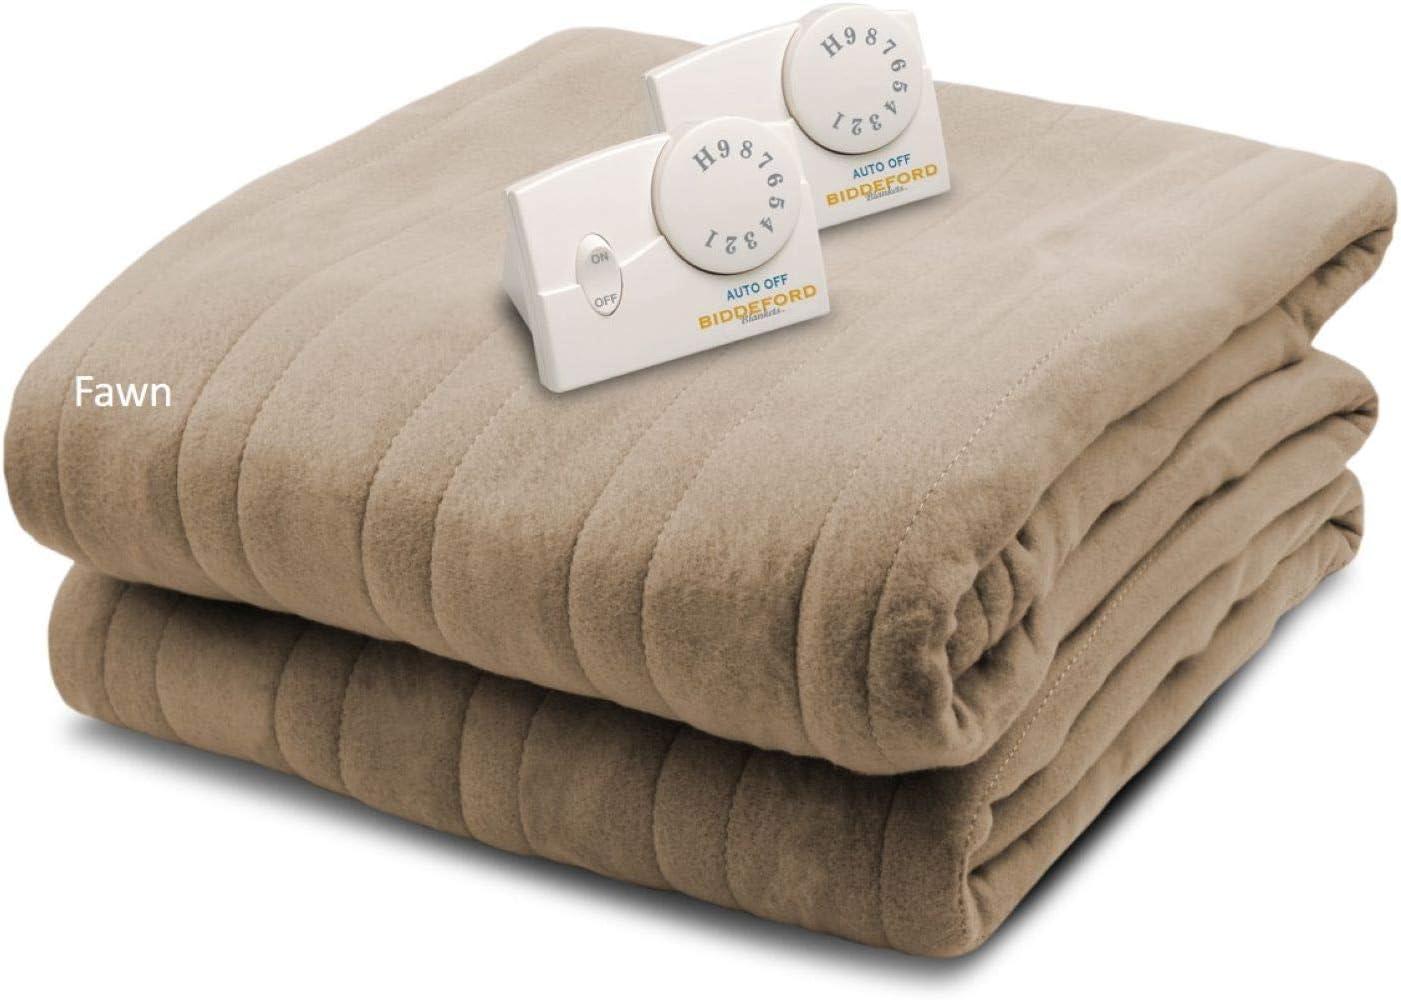 Biddeford Blankets, LLC Comfort Knit Heated Blanket, King, Fawn